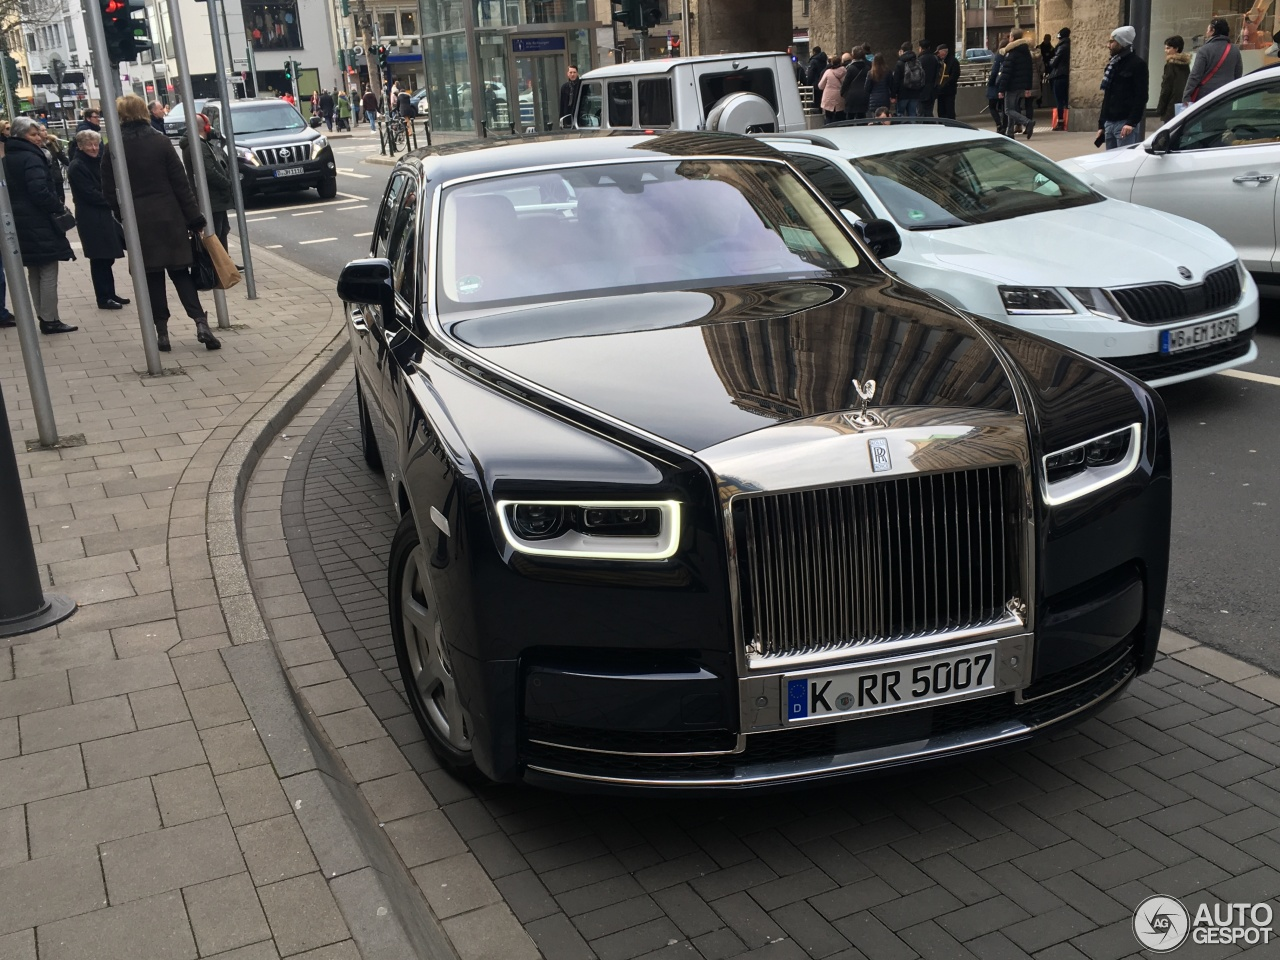 Rolls-Royce Phantom Black - 10 March 2016 - Autogespot |Matte Black Rolls Royce Phantom 2014